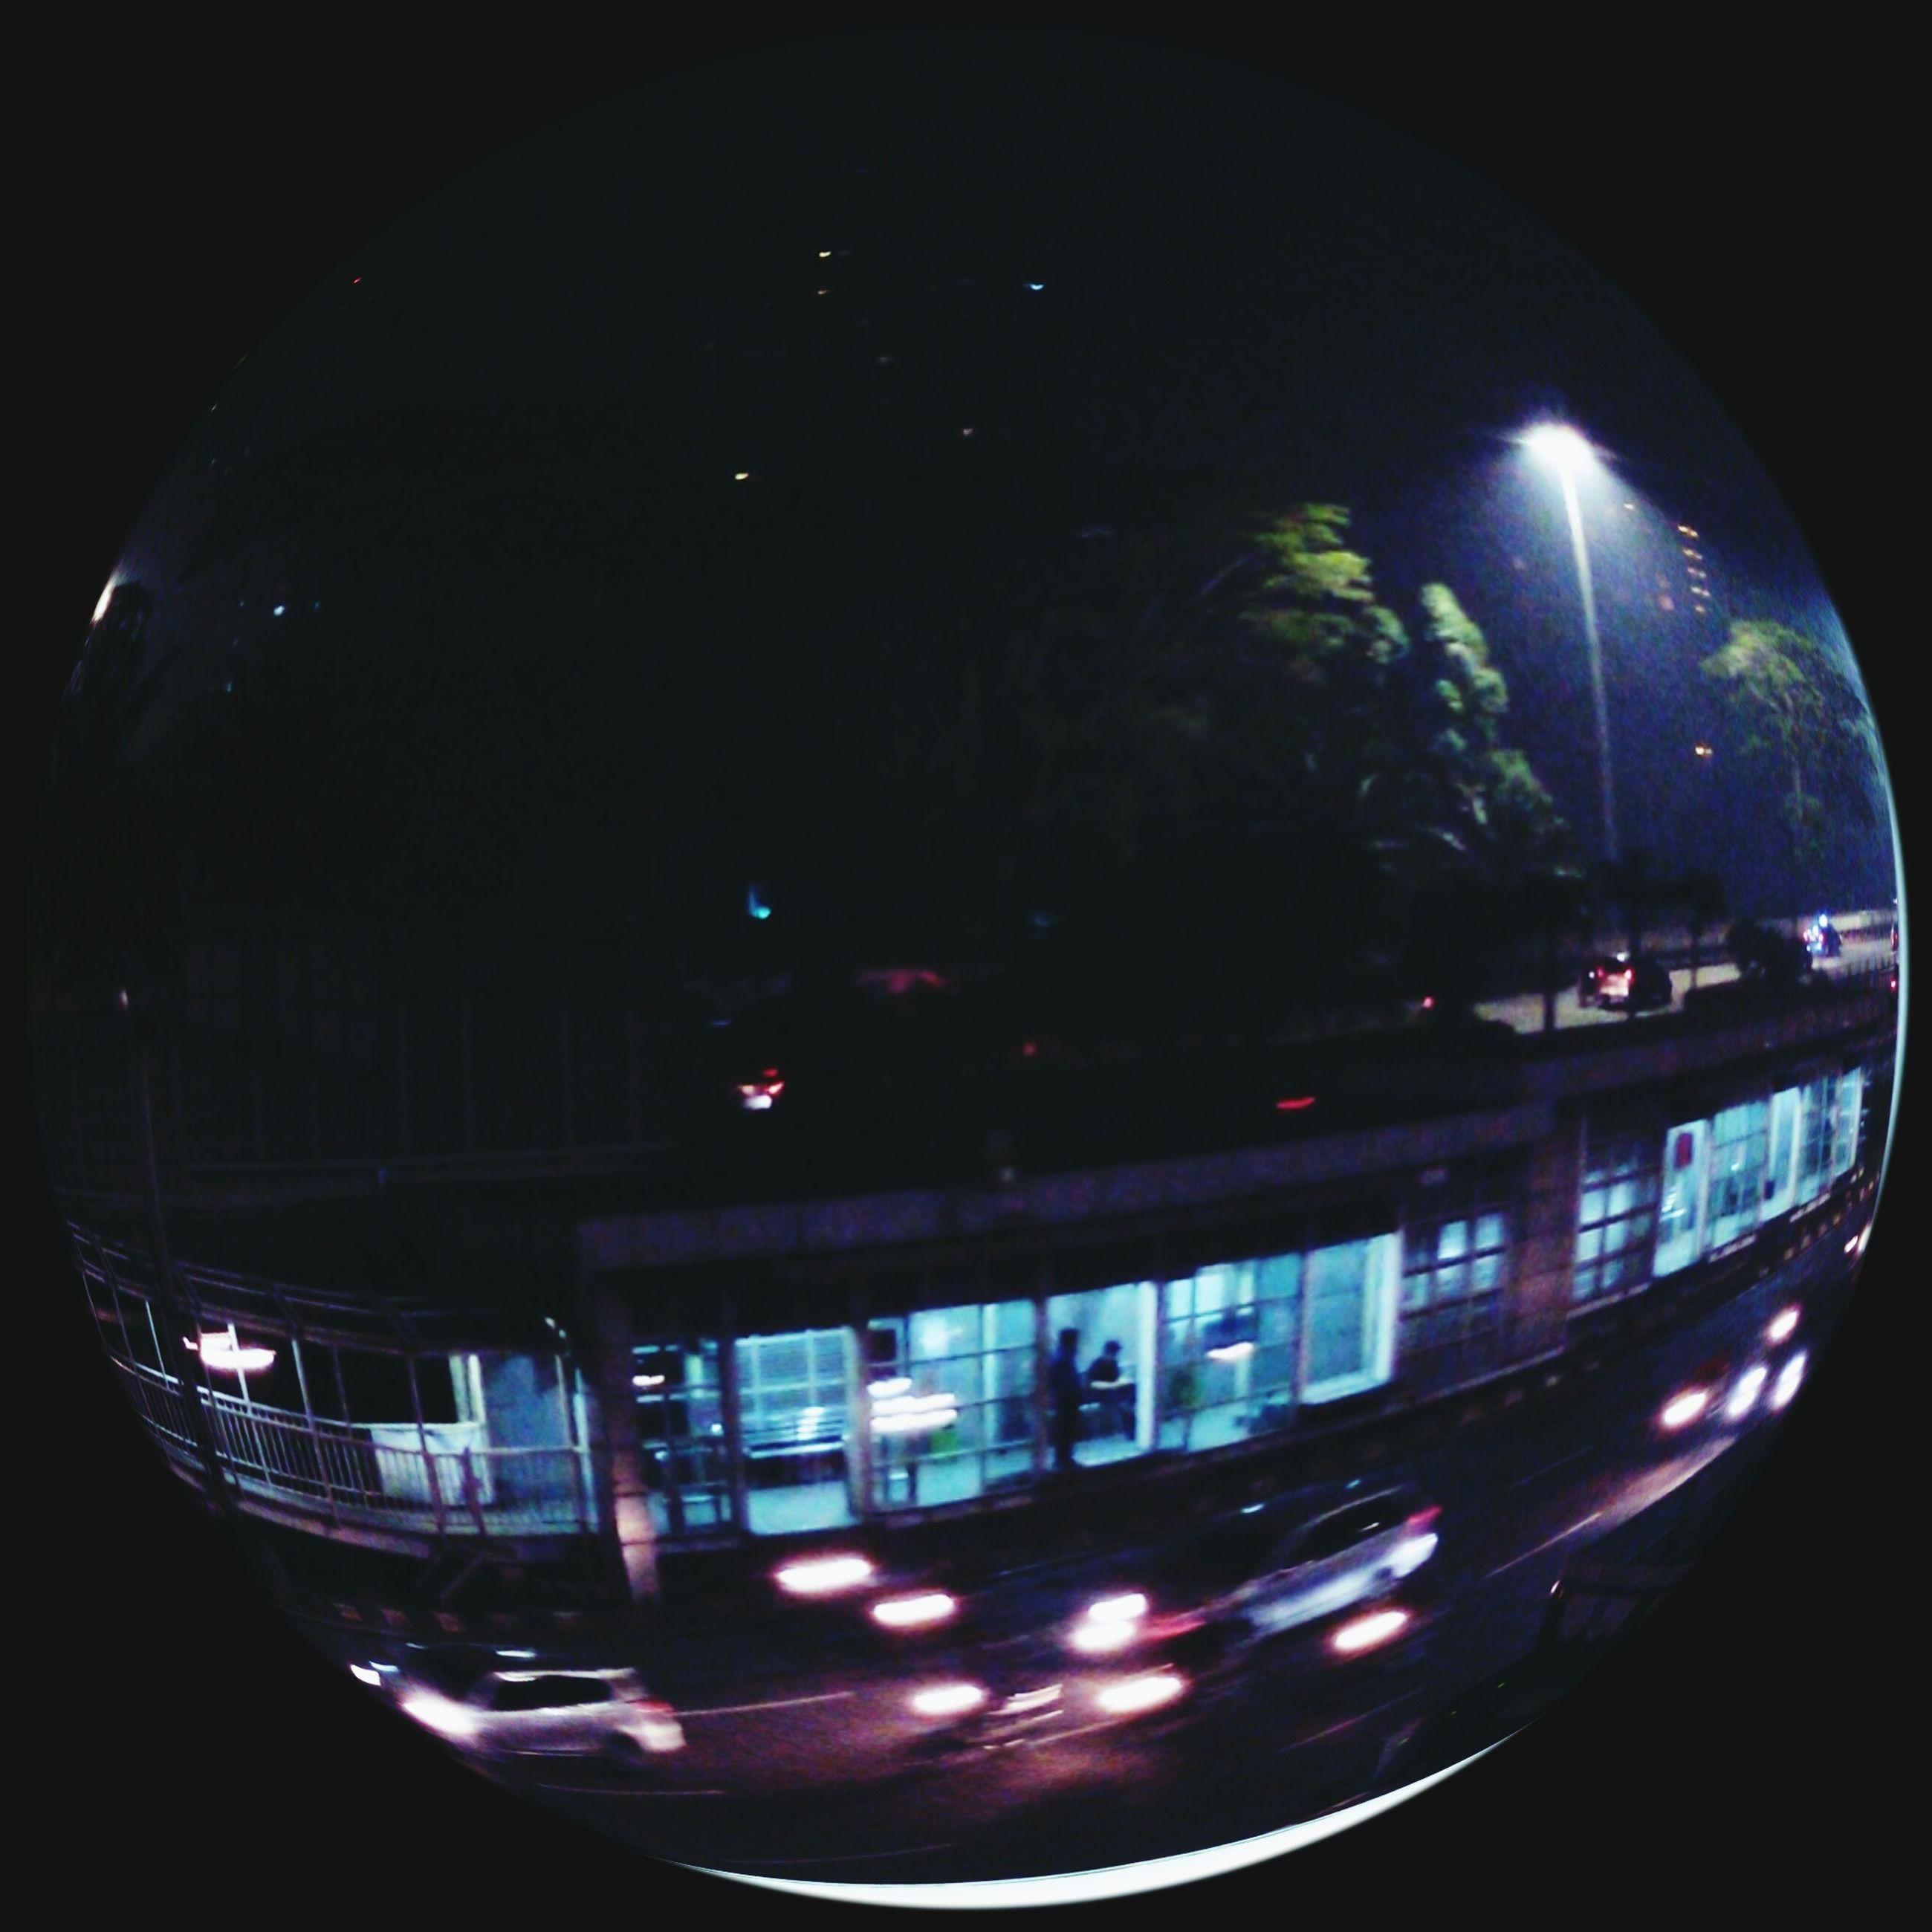 night, illuminated, motion, sky, light trail, glowing, no people, city, outdoors, multi colored, dark, city life